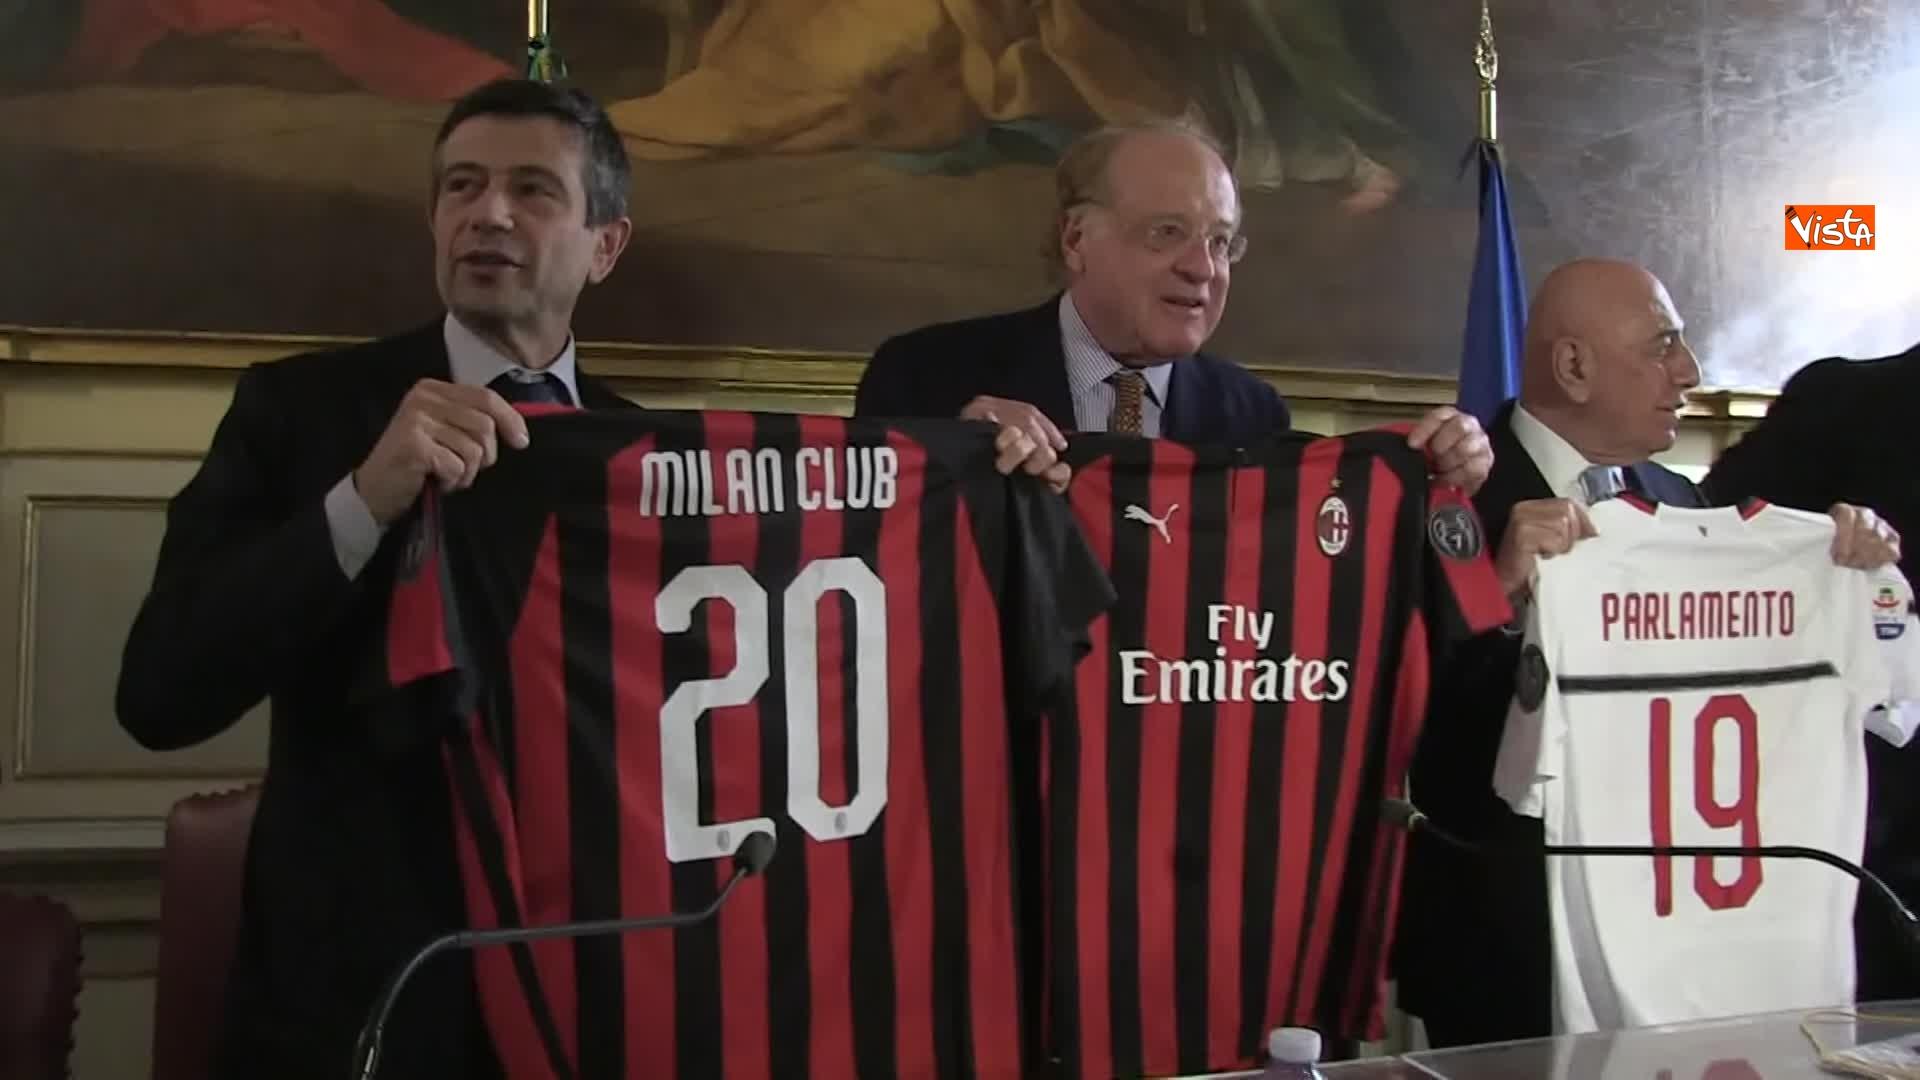 Maurizio Lupi, Paolo Scaroni, Adriano Galliani